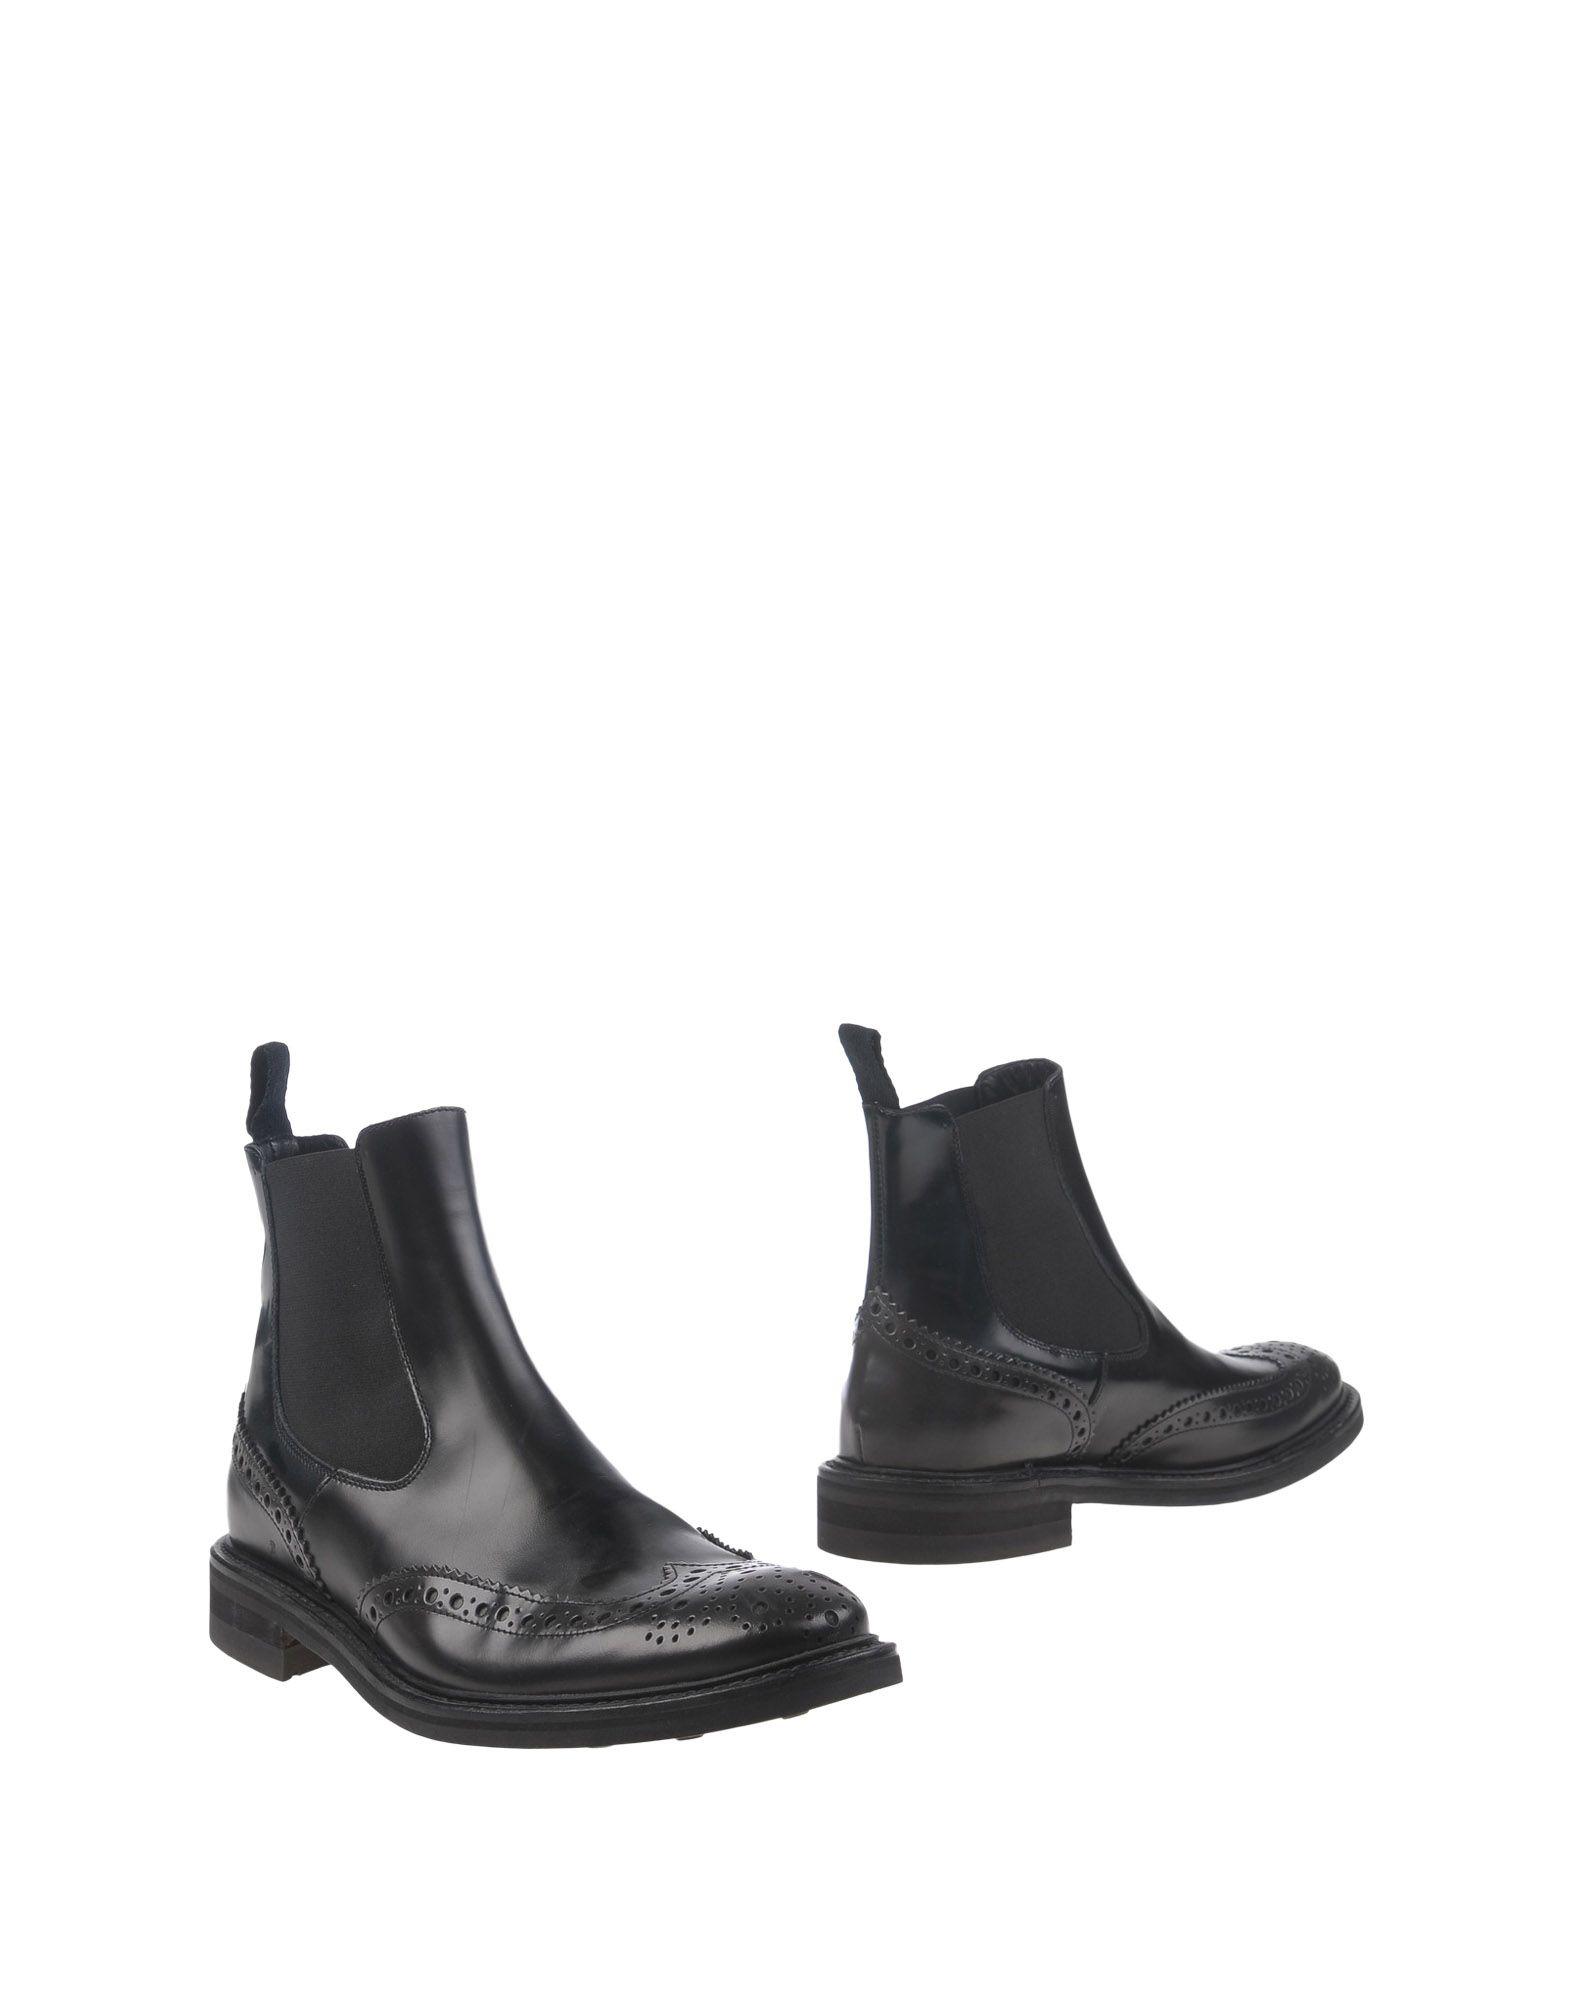 Seboy's Ankle Boot - Women Seboy's Ankle Boots online 11295724DE on  Australia - 11295724DE online fe5790